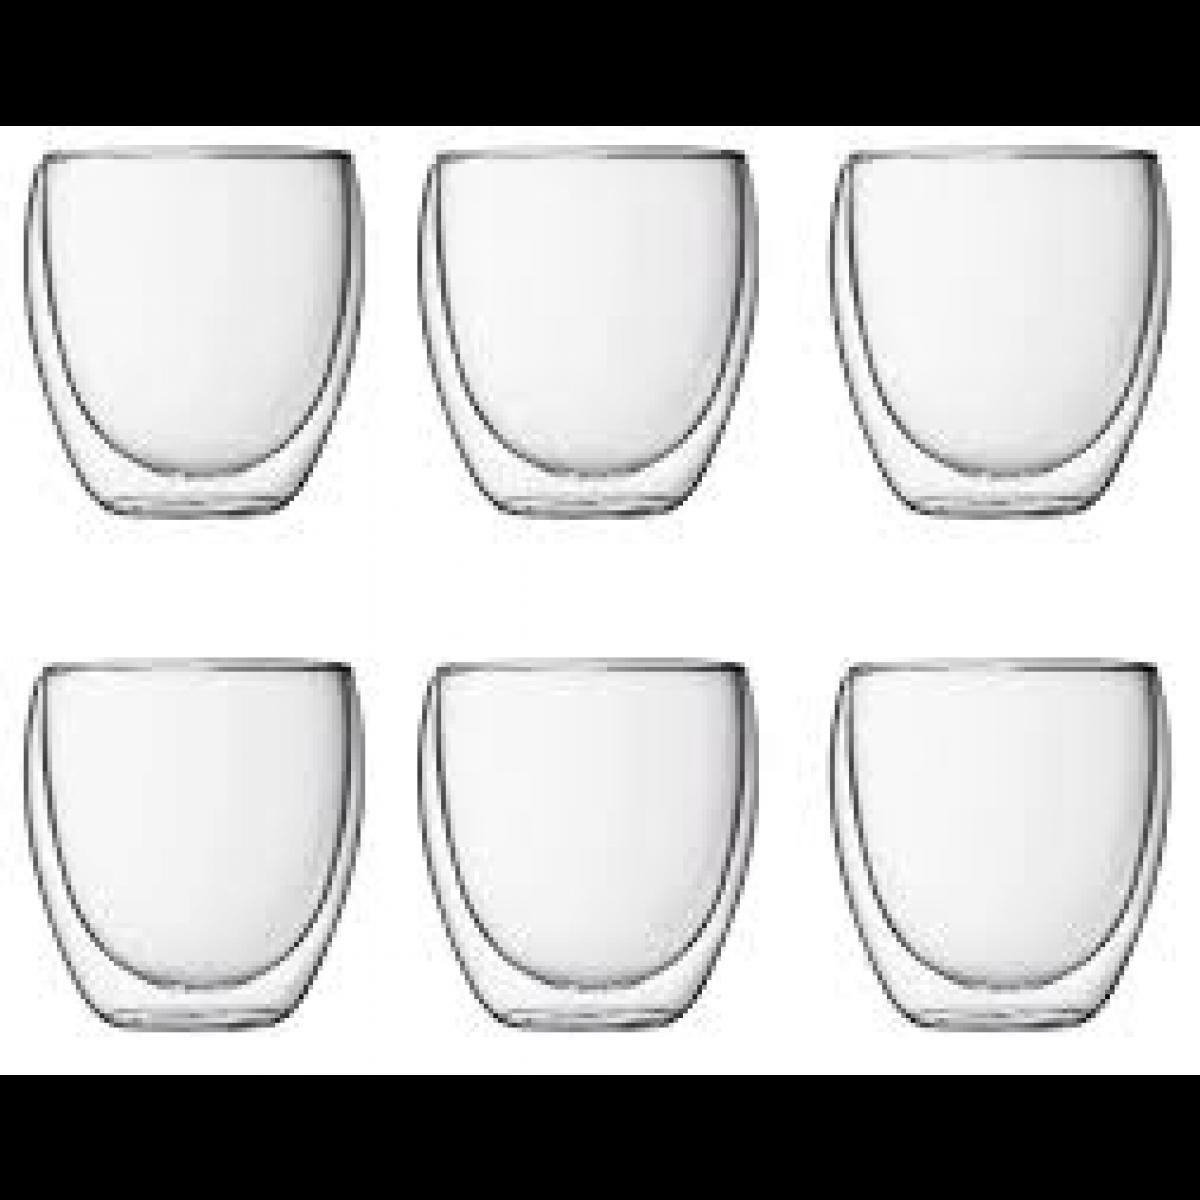 BODUMPavinaoutdoorglas6stk025ltr-01